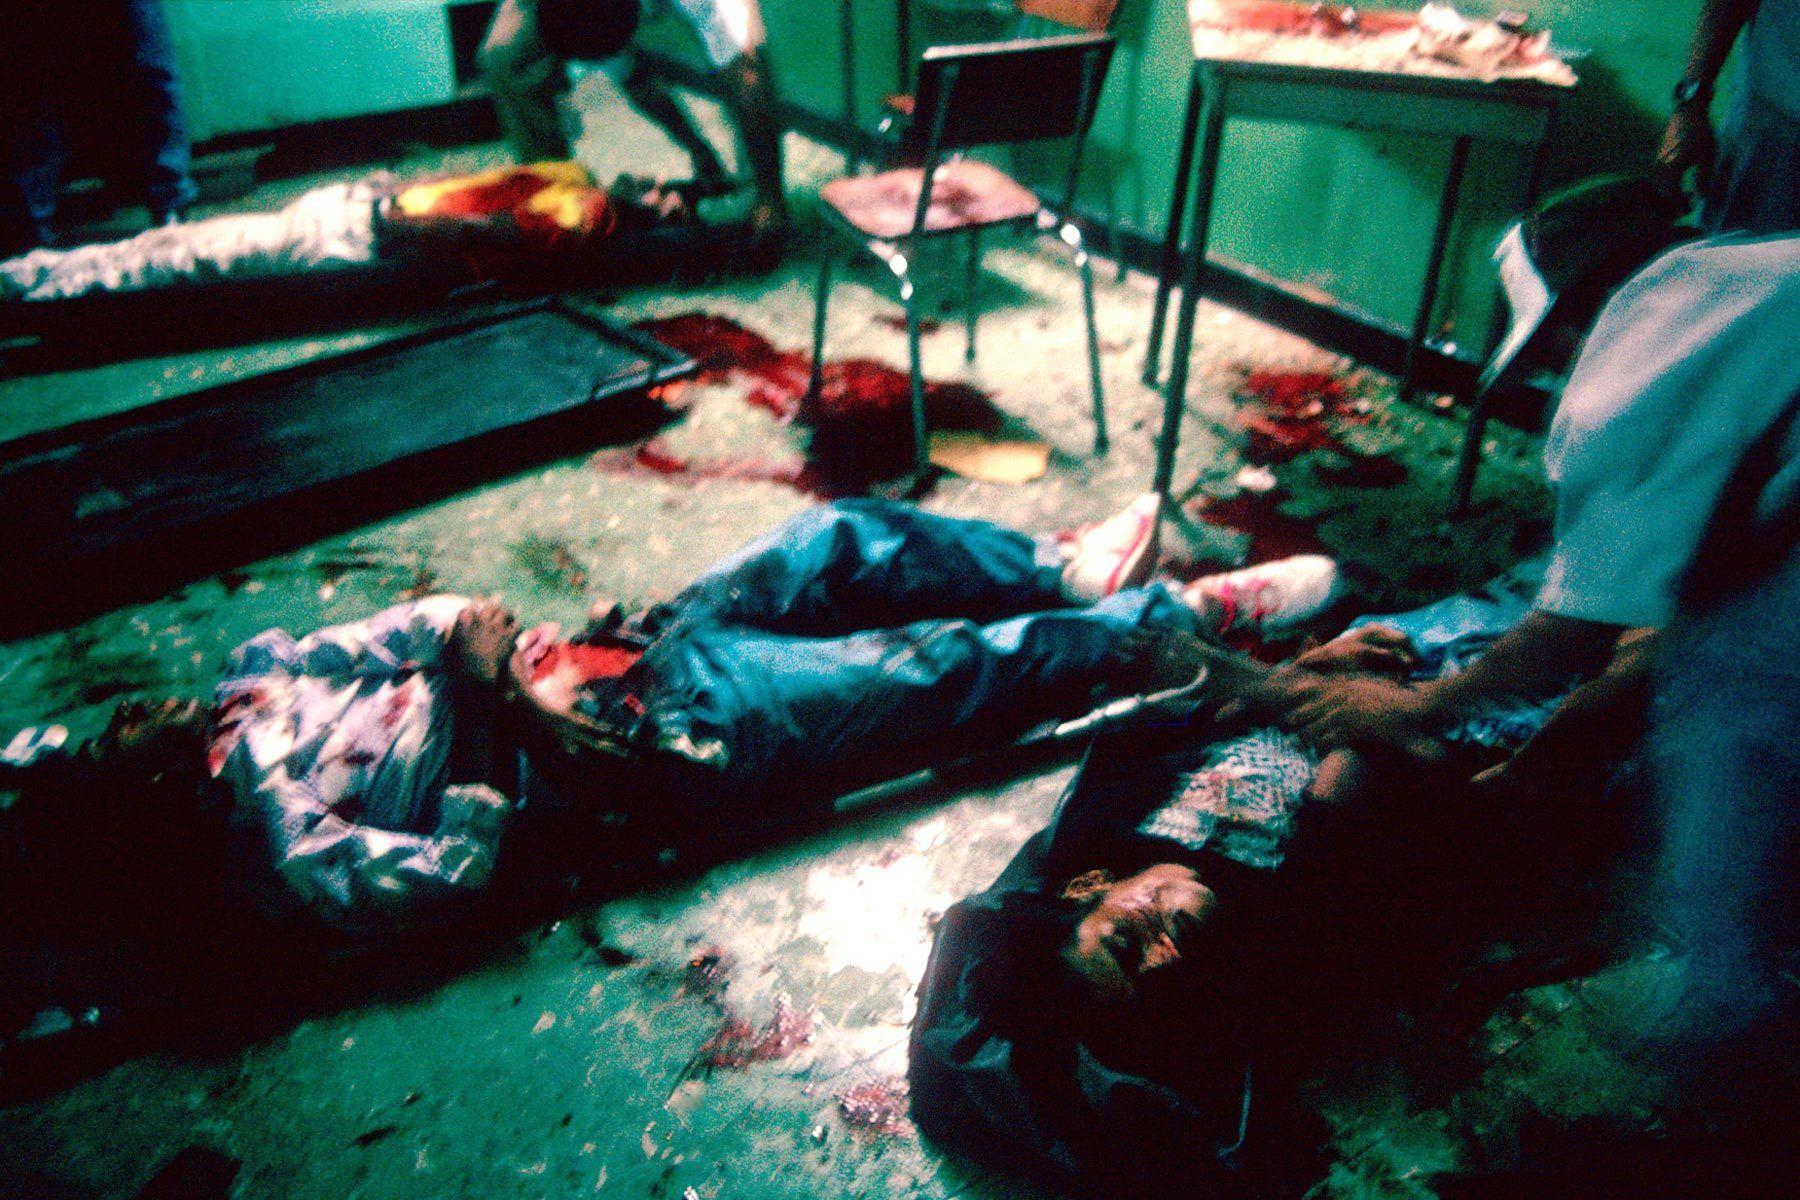 A massacre.